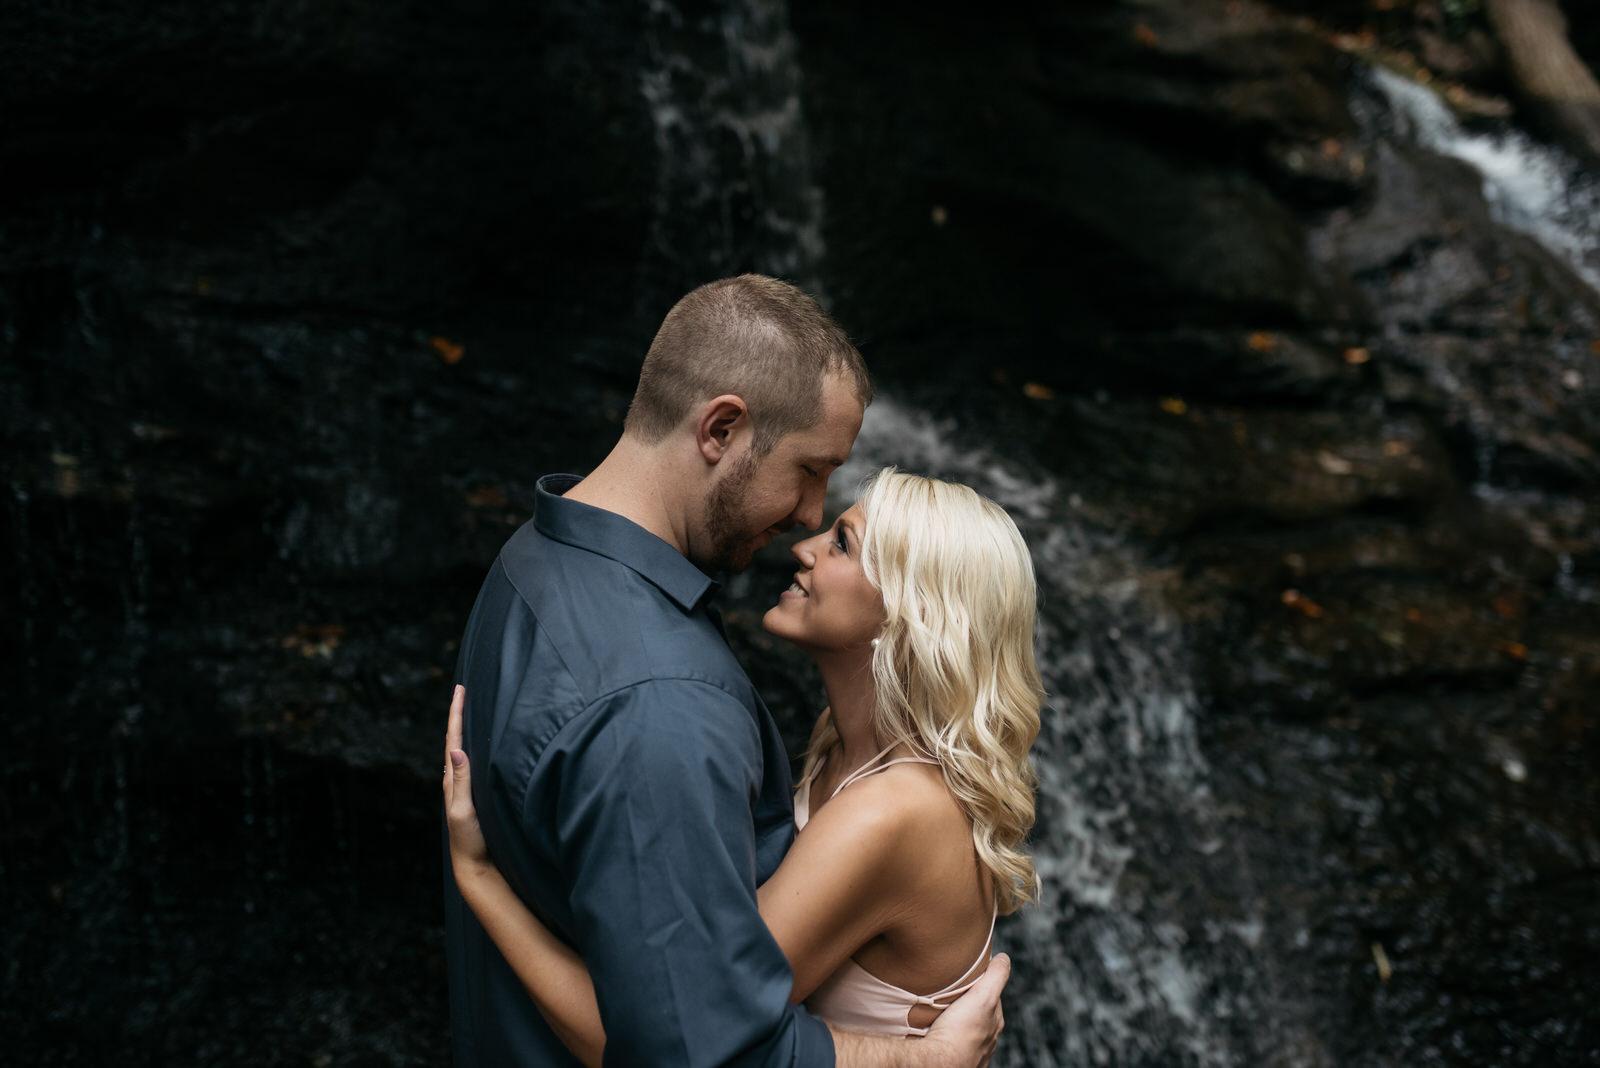 McConnells-Mill-Engagement-Photos-46.jpg